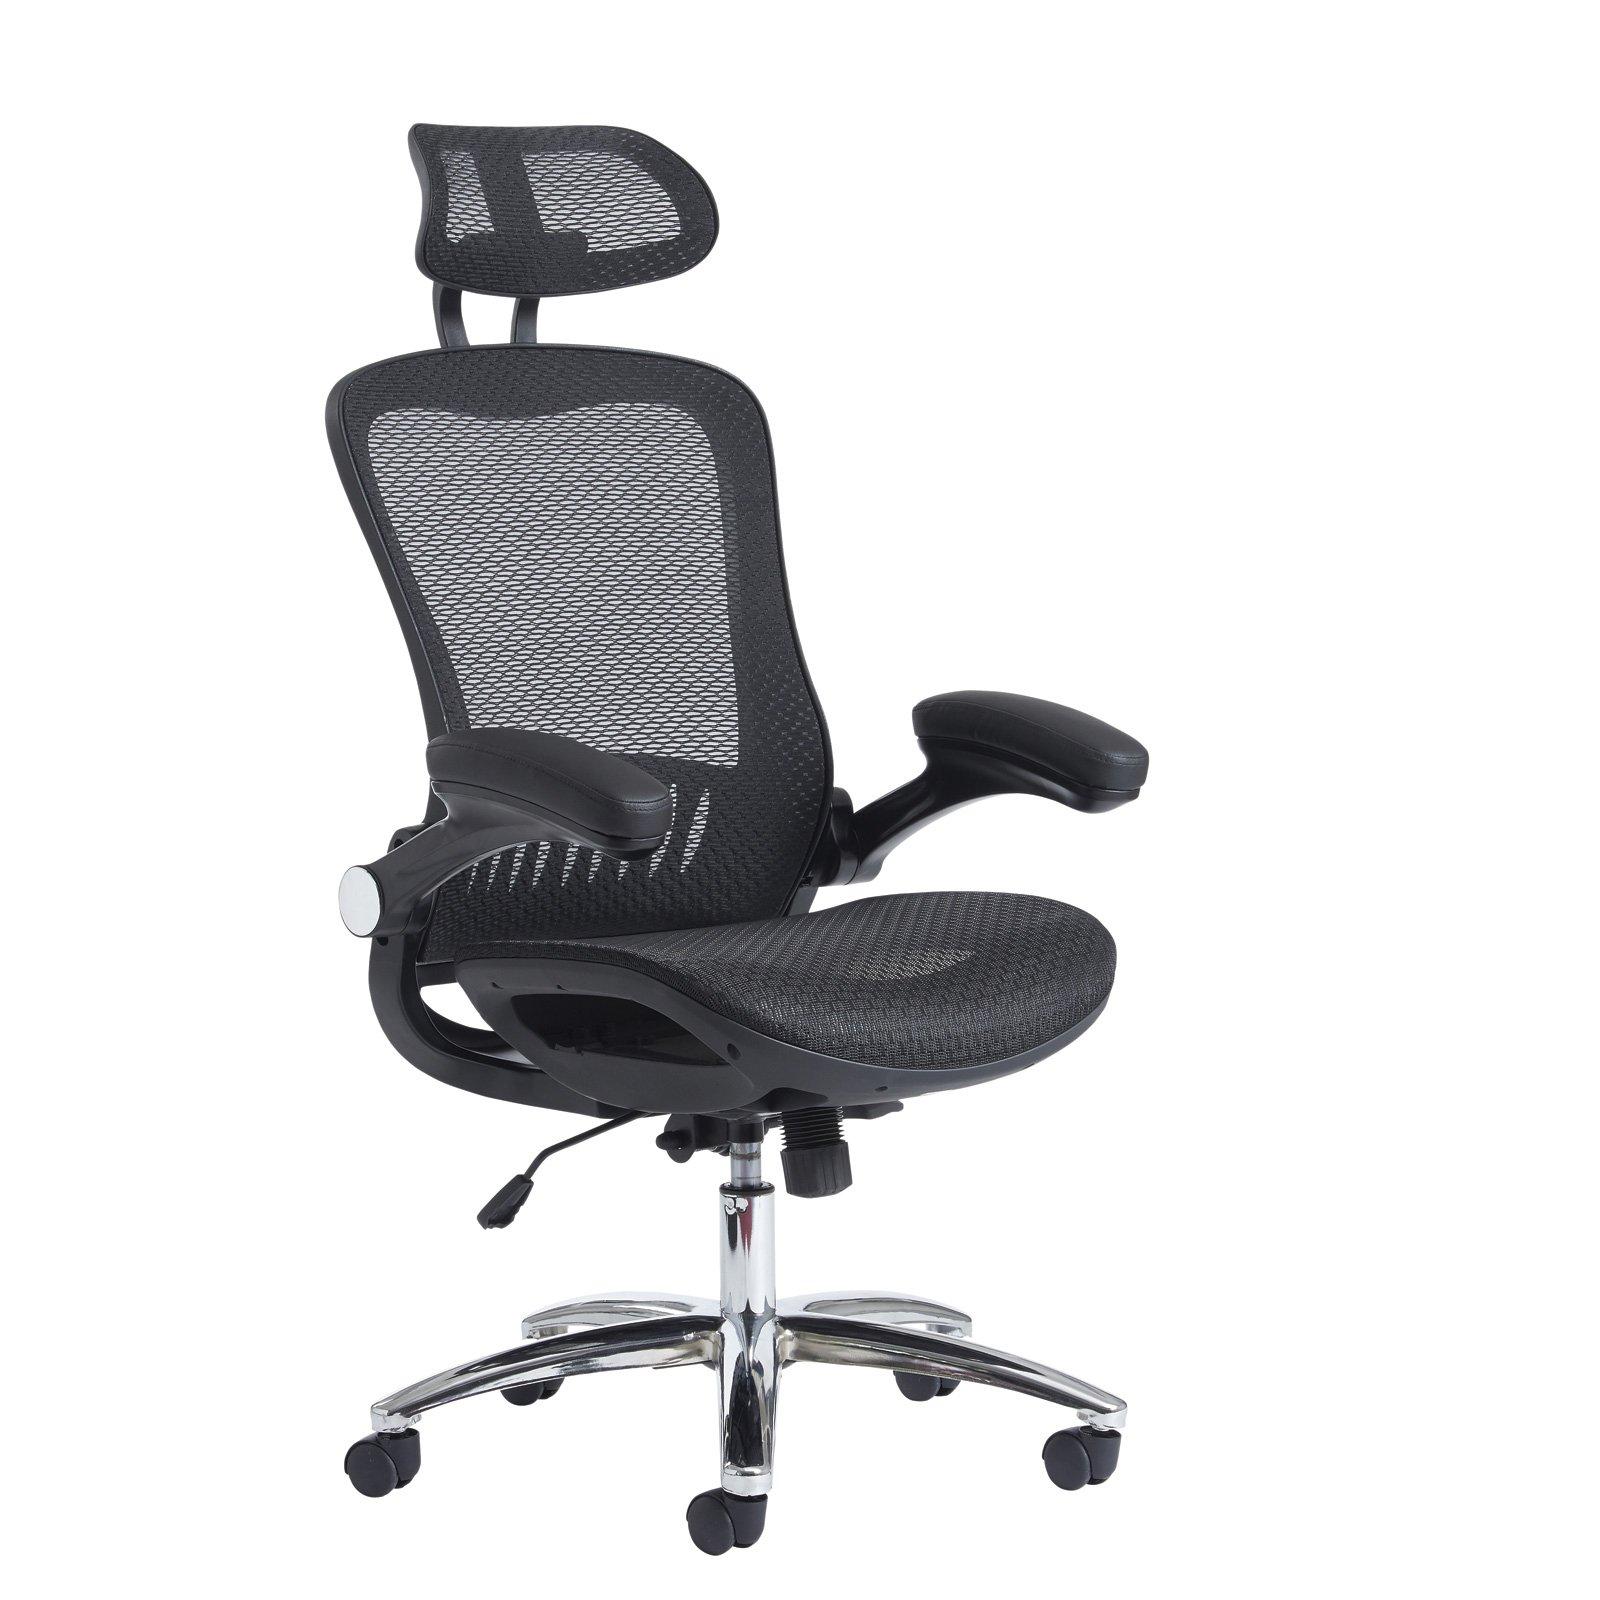 Curva high back mesh chair - black